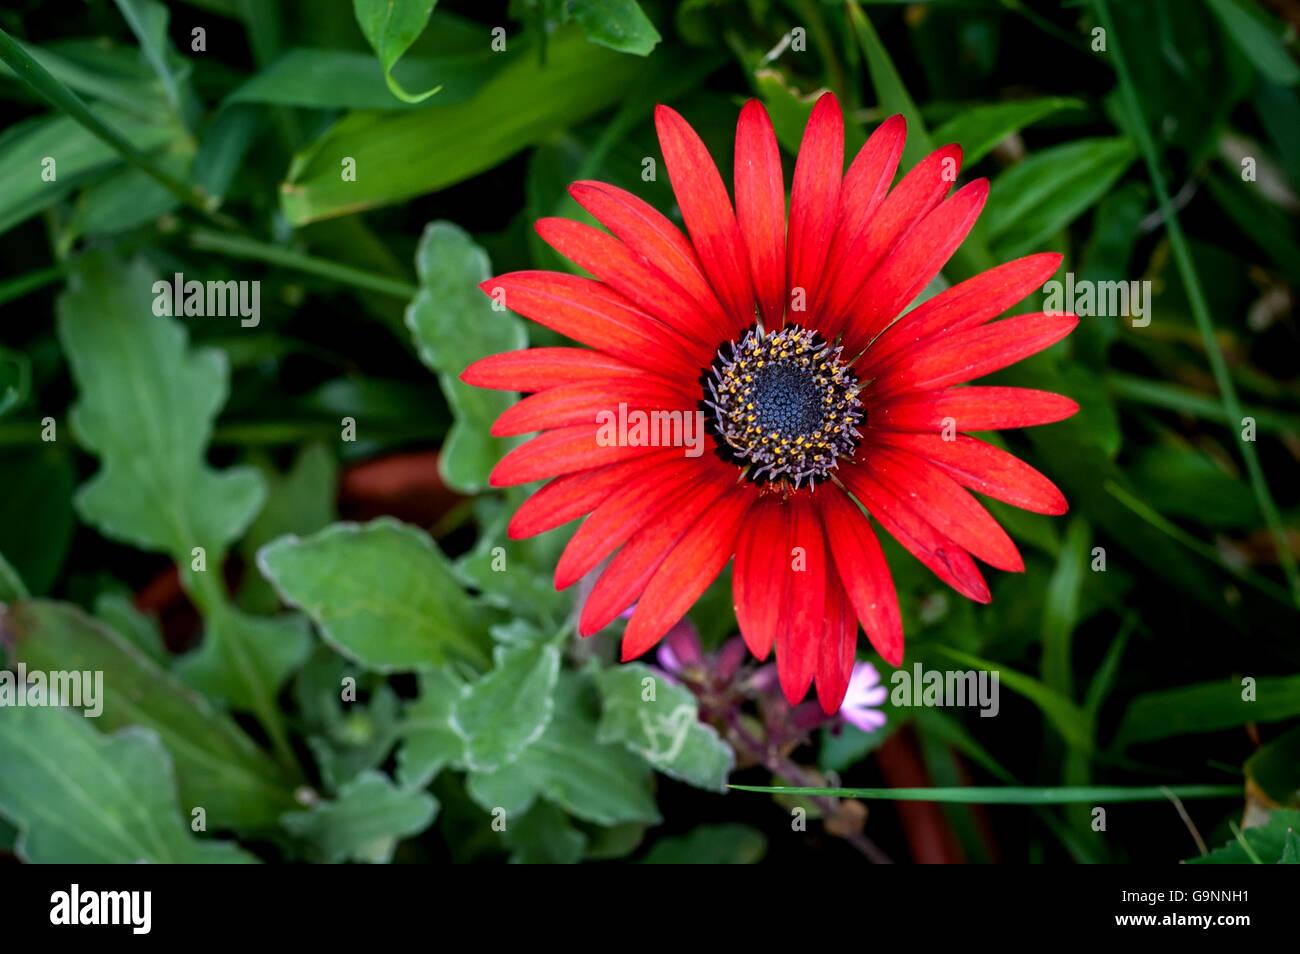 Gerbera, perhaps an African Daisy, an Asteraceae. - Stock Image